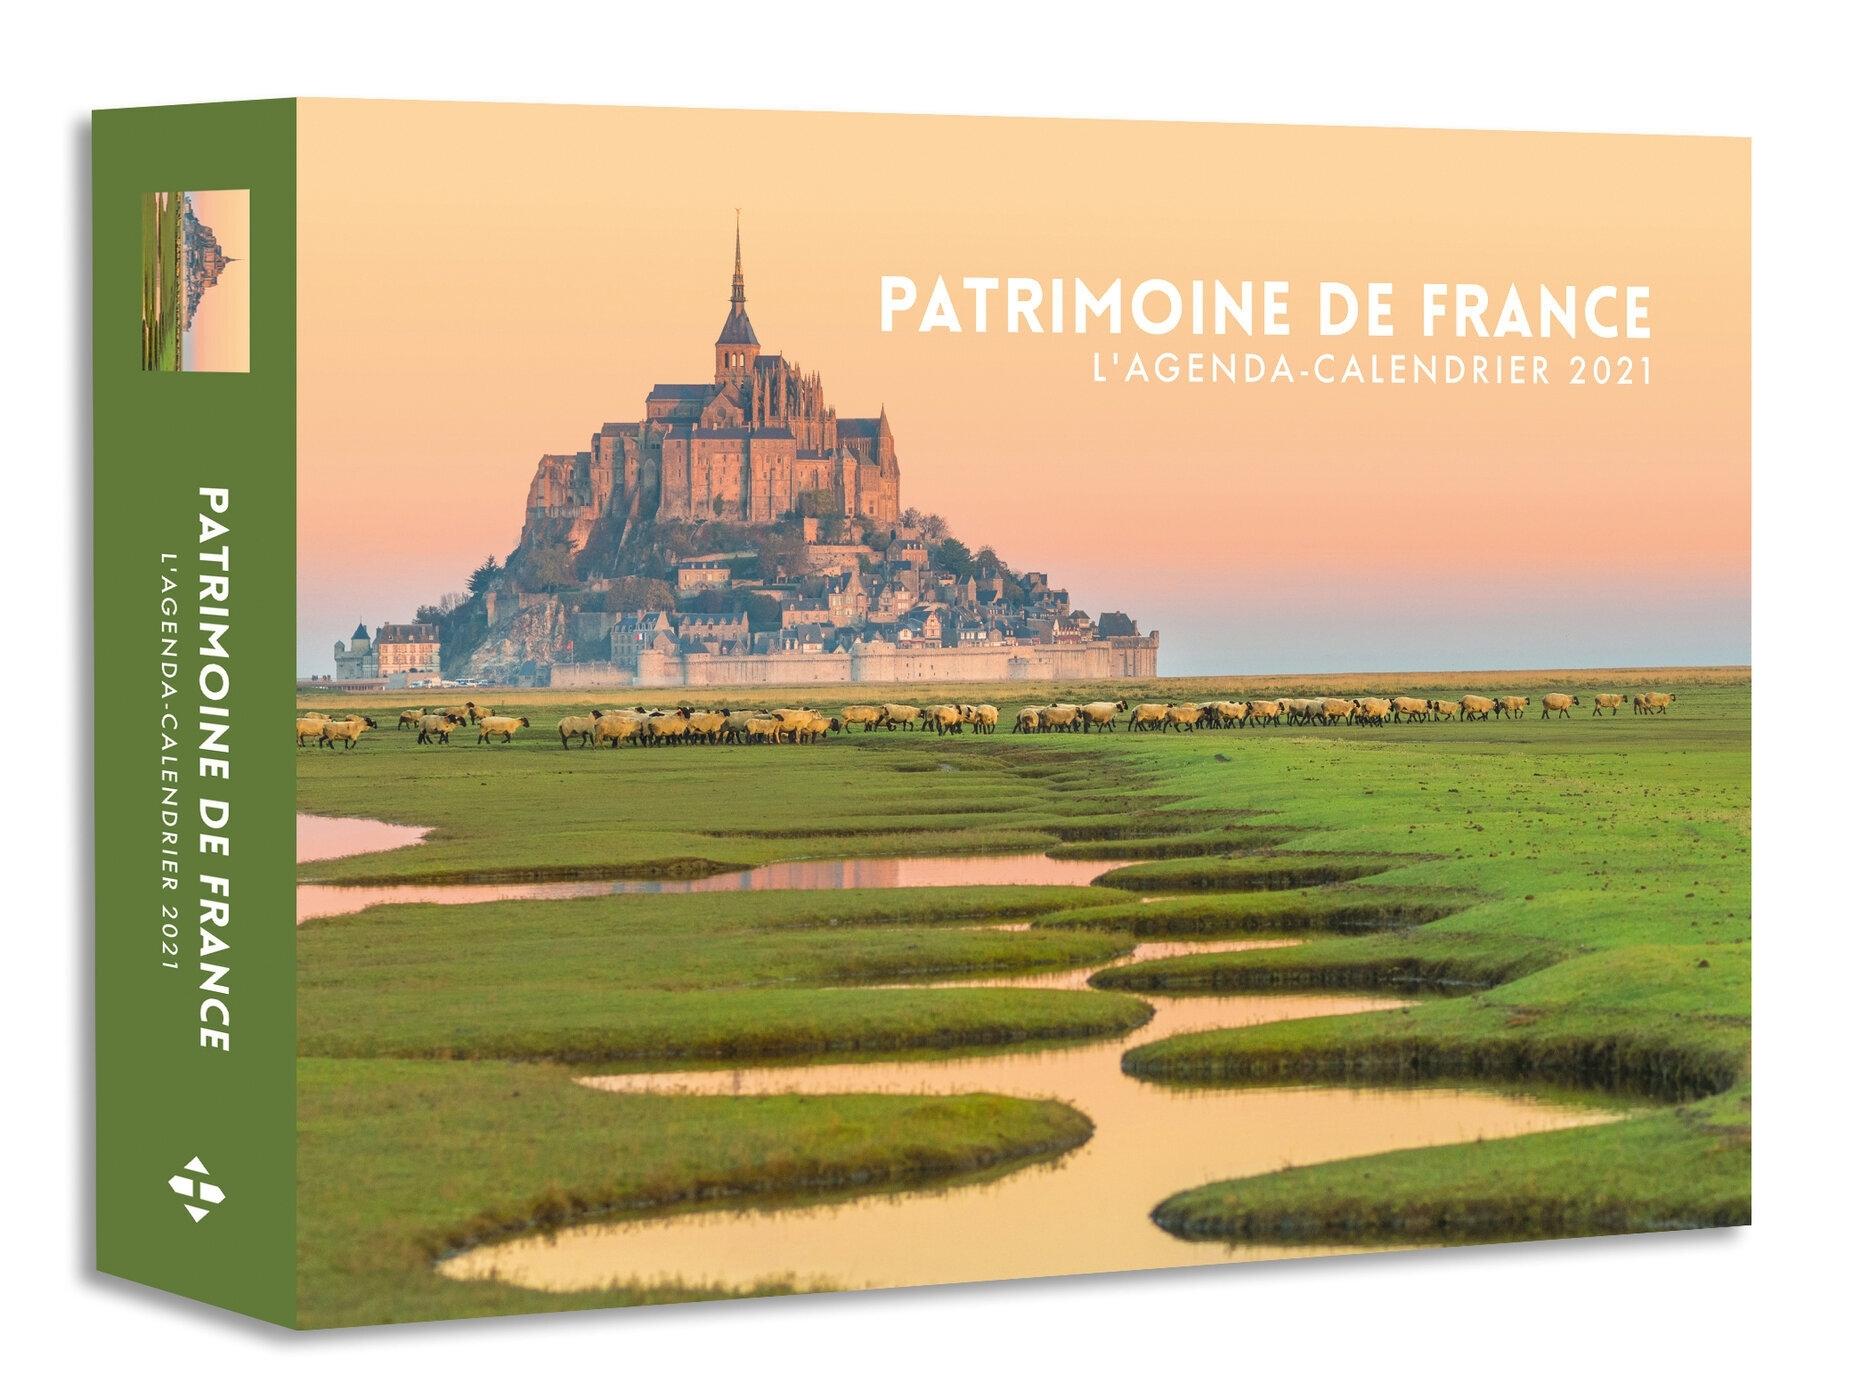 AGENDA CALENDRIER PATRIMOINE DE FRANCE 2021